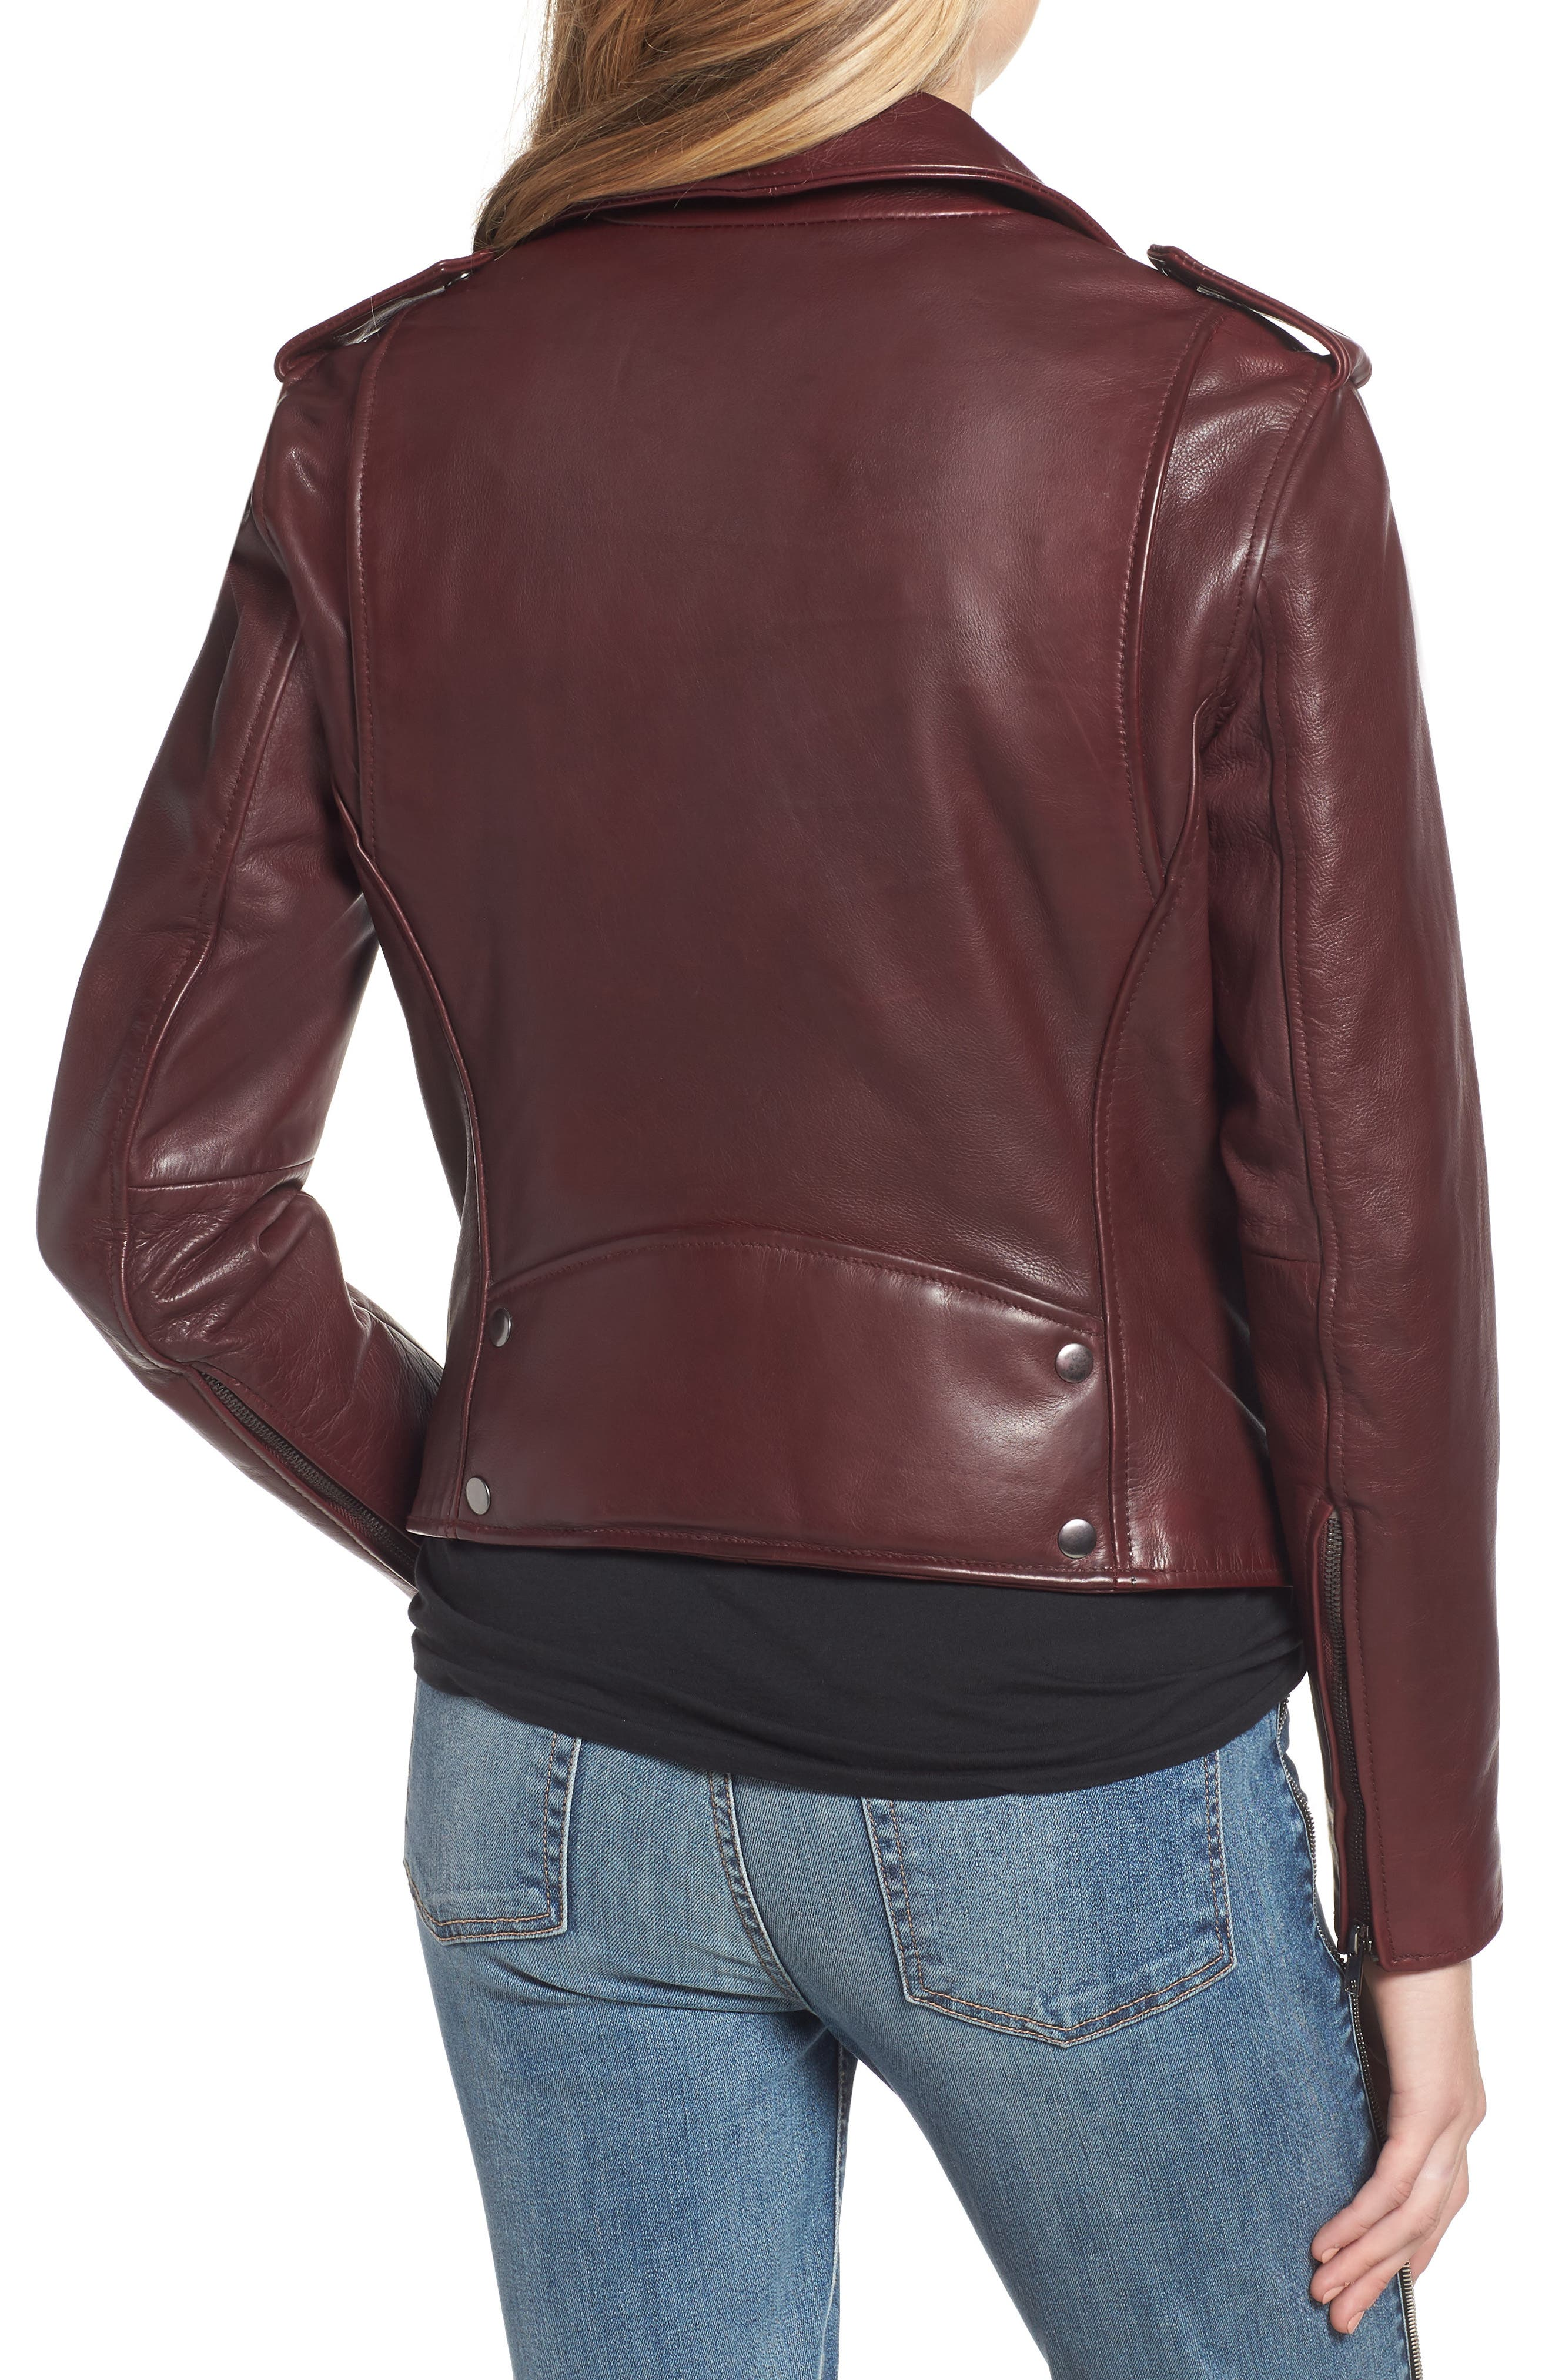 Leather Biker Jacket,                             Alternate thumbnail 2, color,                             BLACKENED BORDEAUX